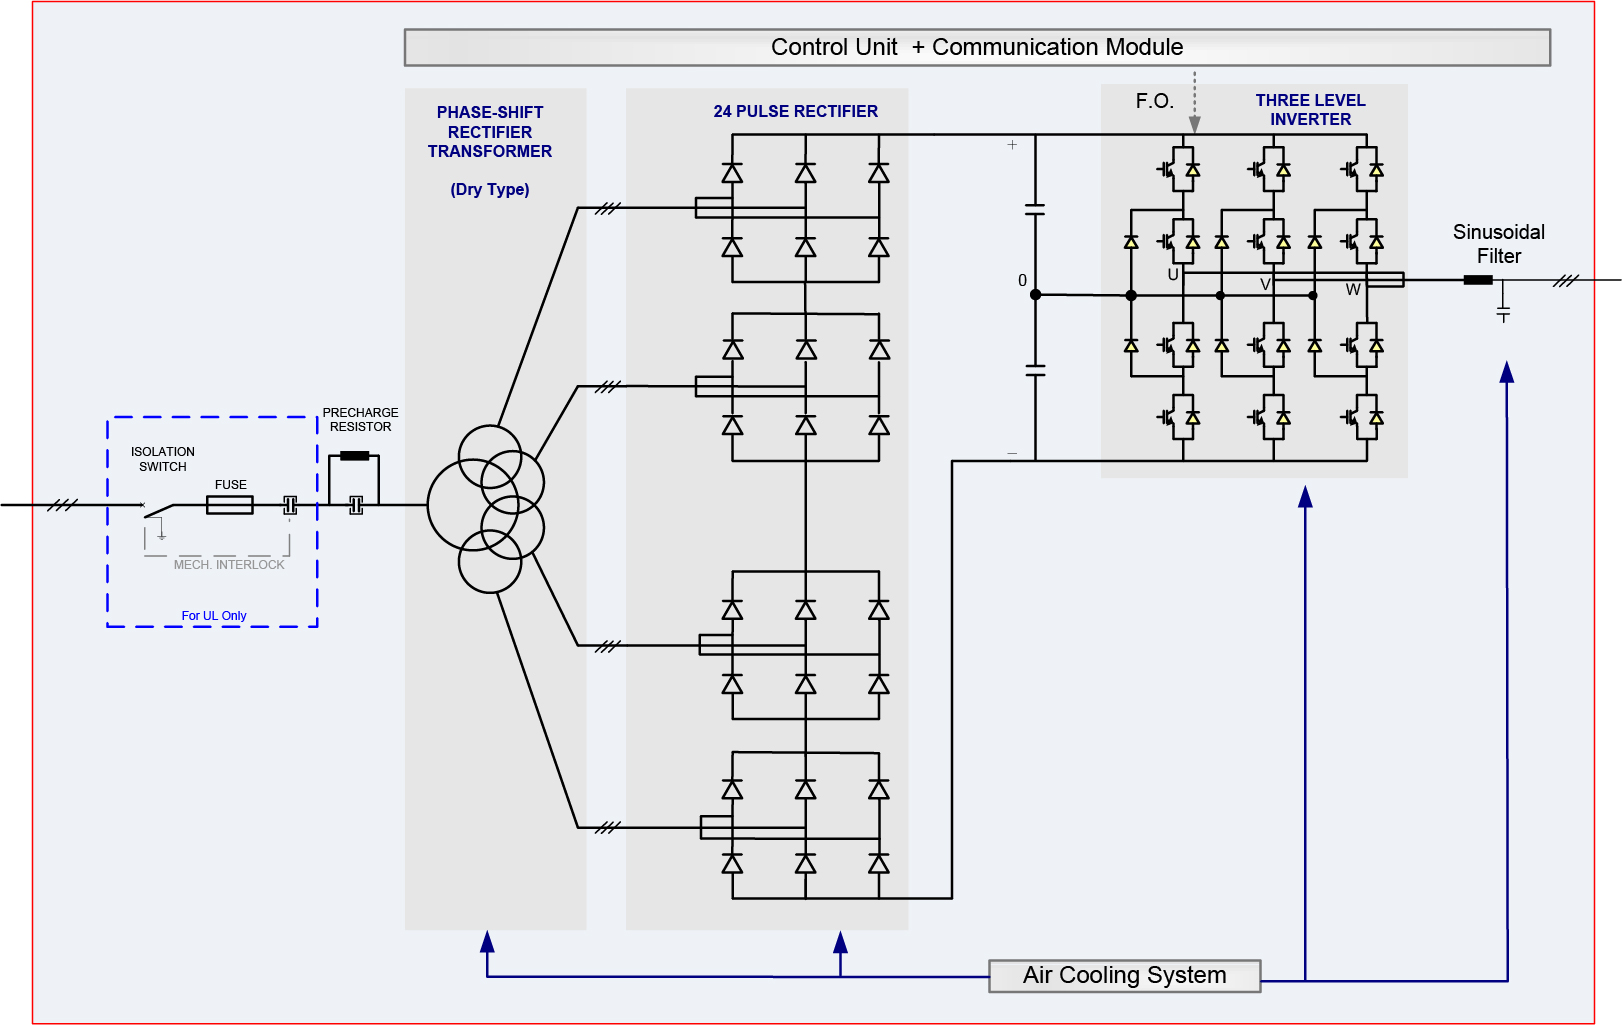 6P topology